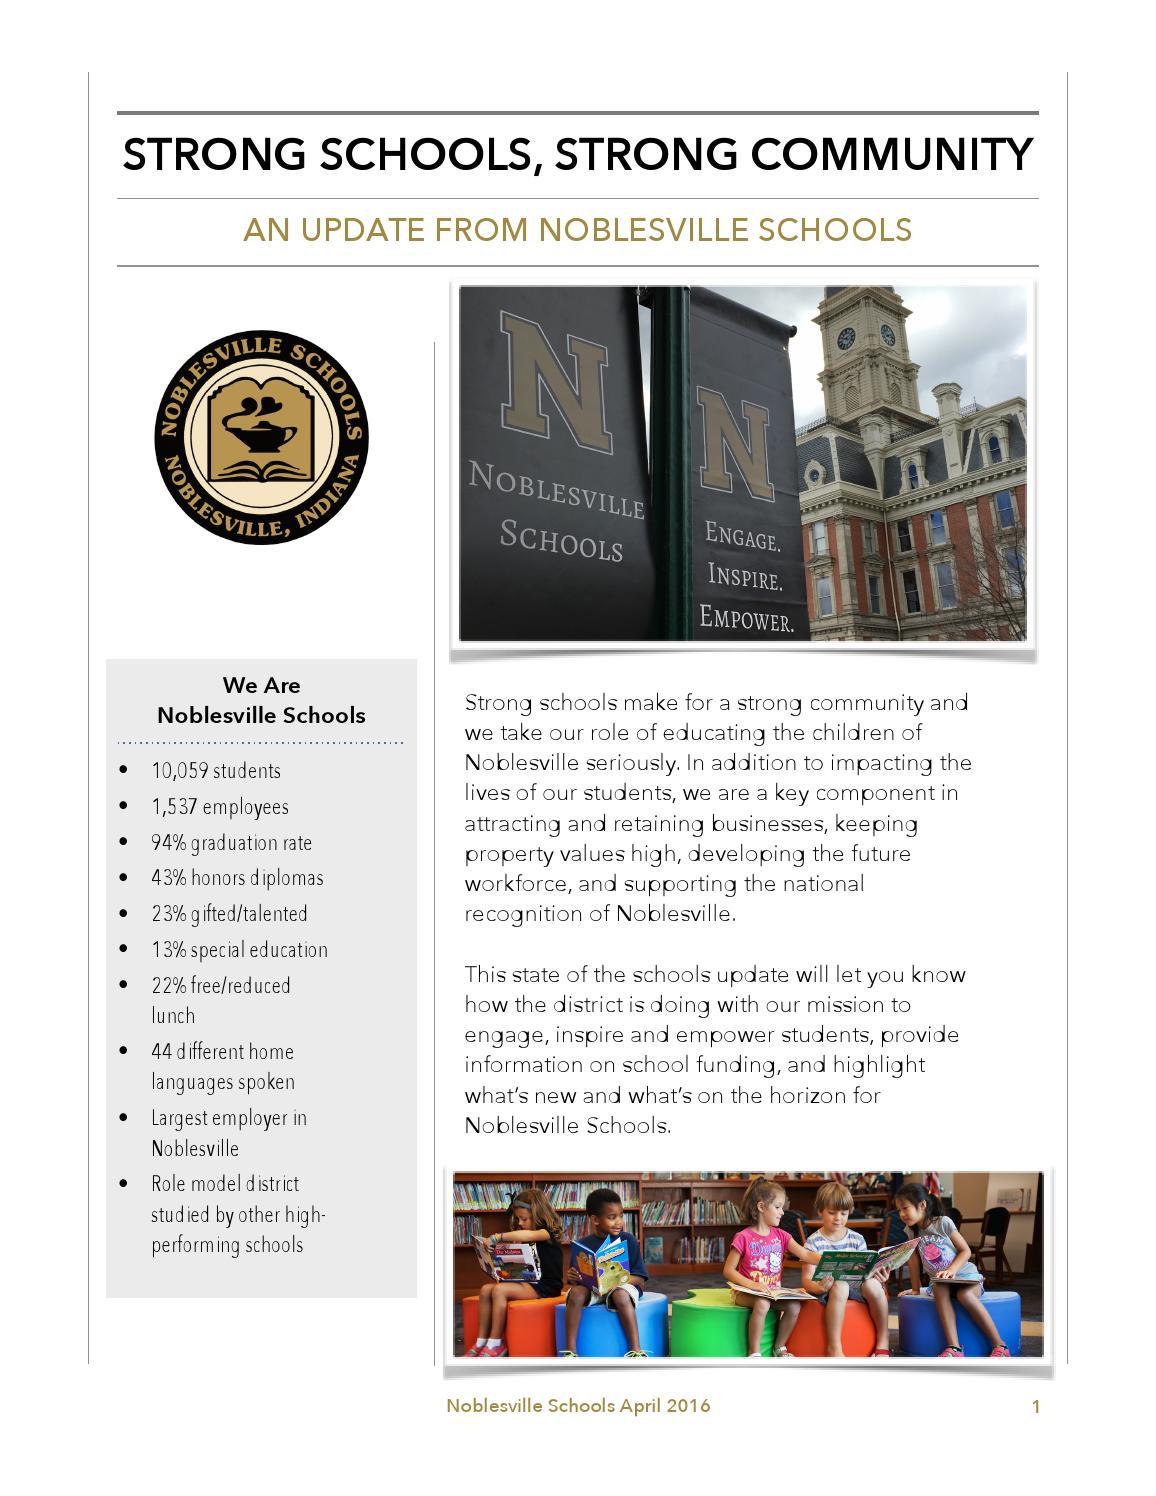 Noblesville Schools Food Menu